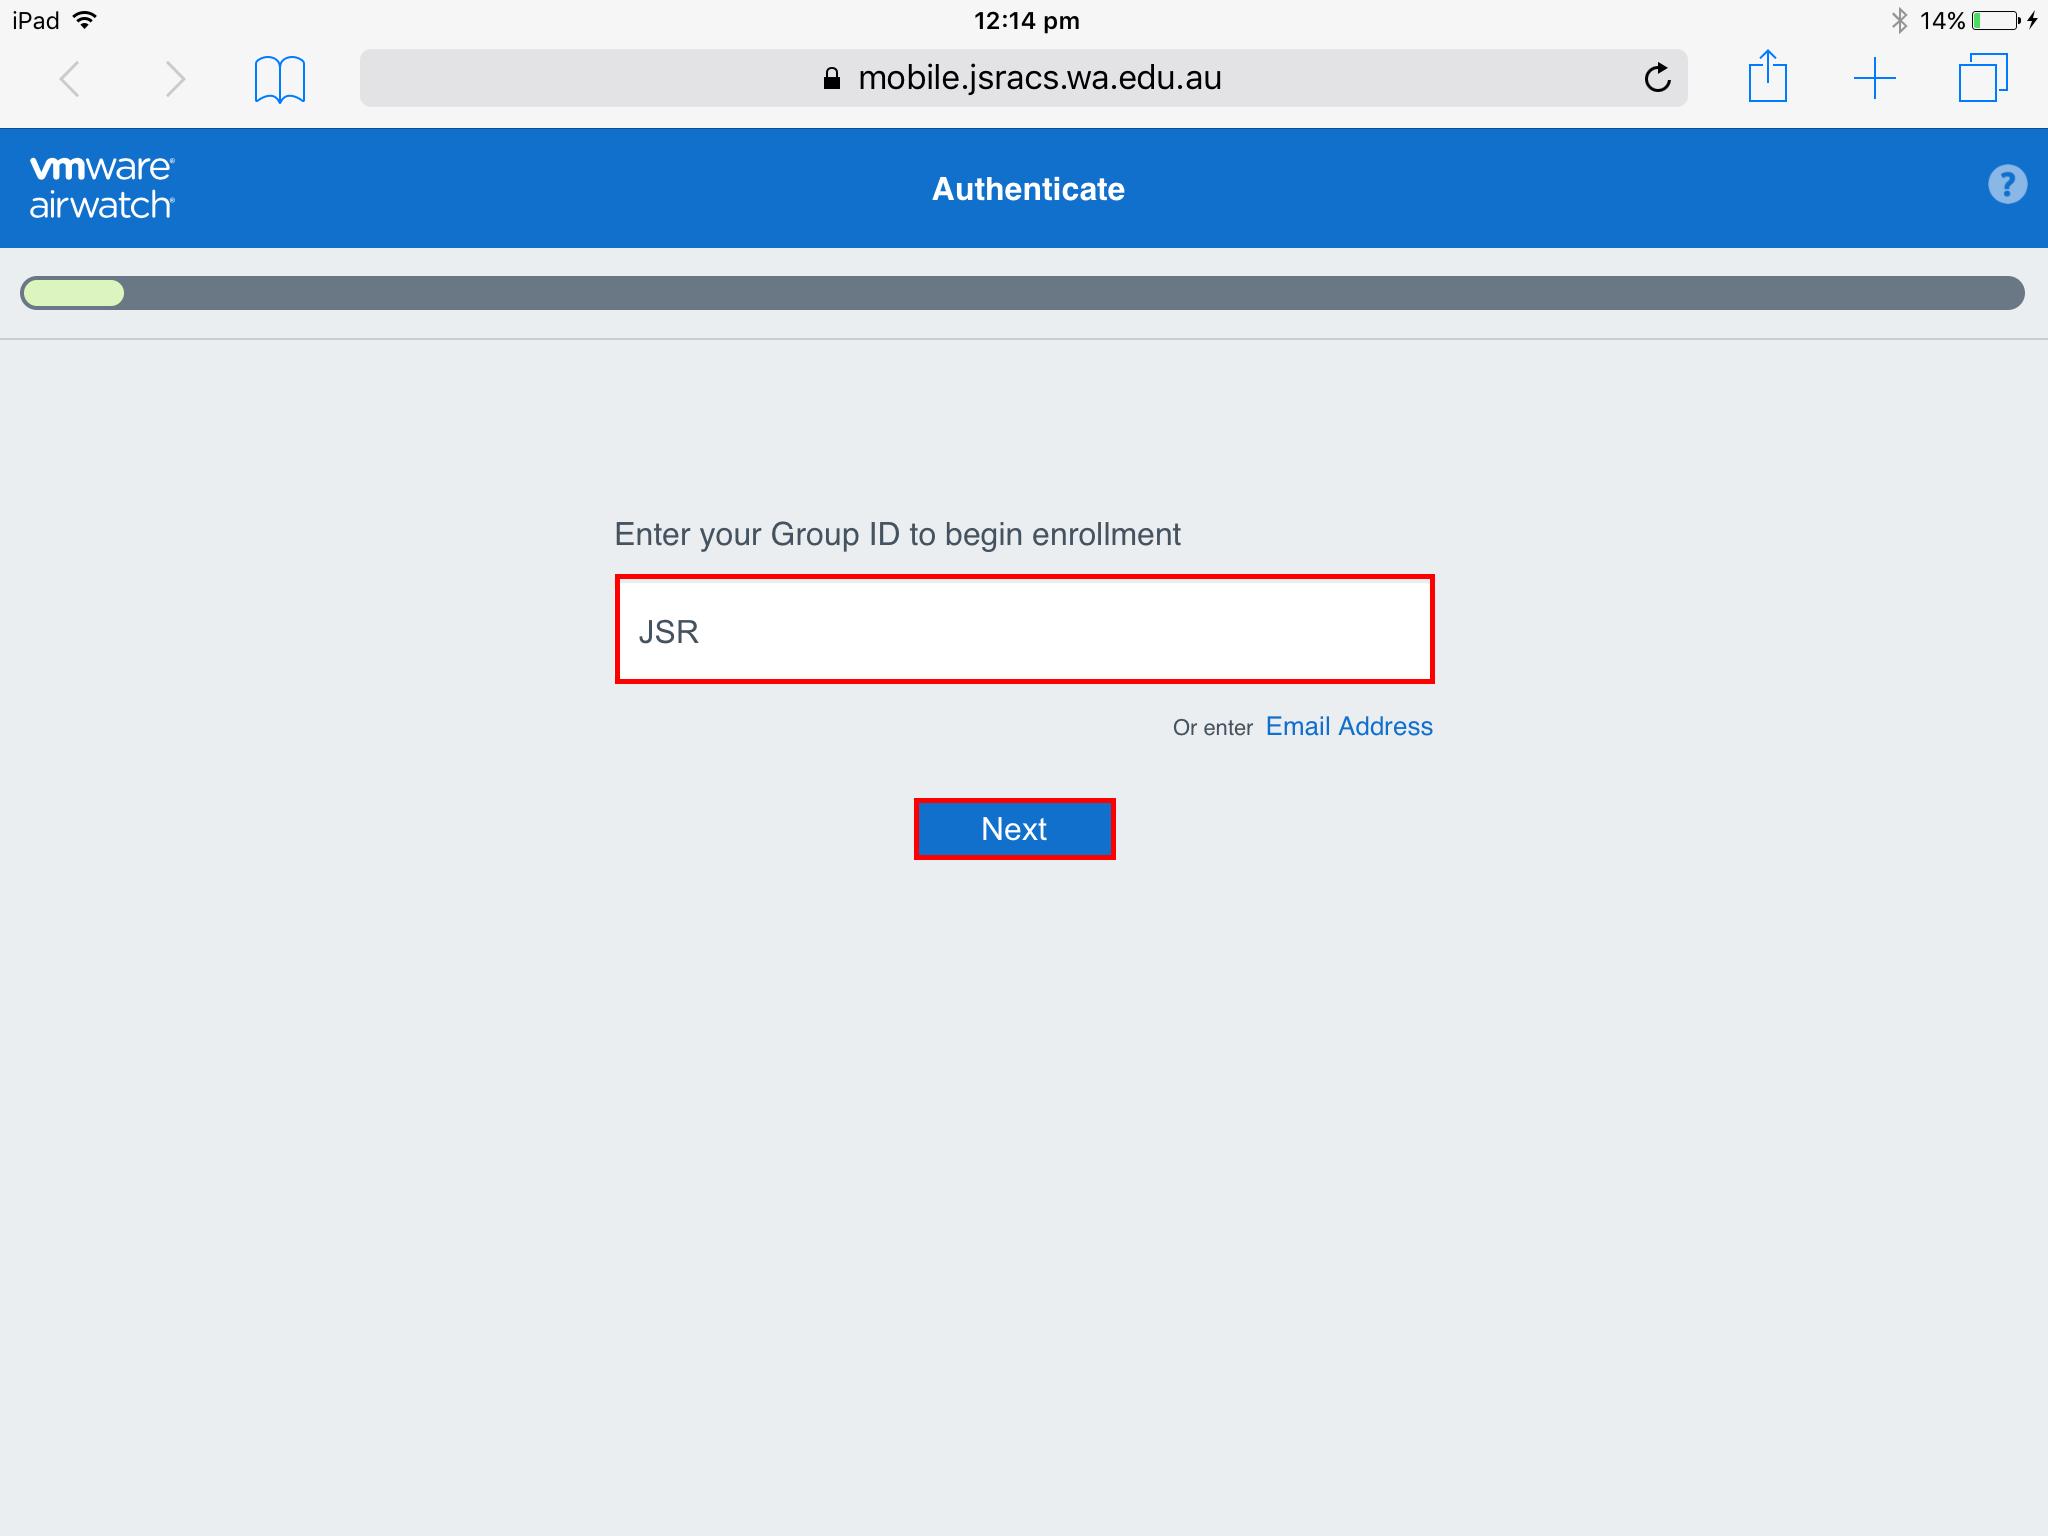 How do I Enrol My iPad into AirWatch? - JSRACS Knowledge Base